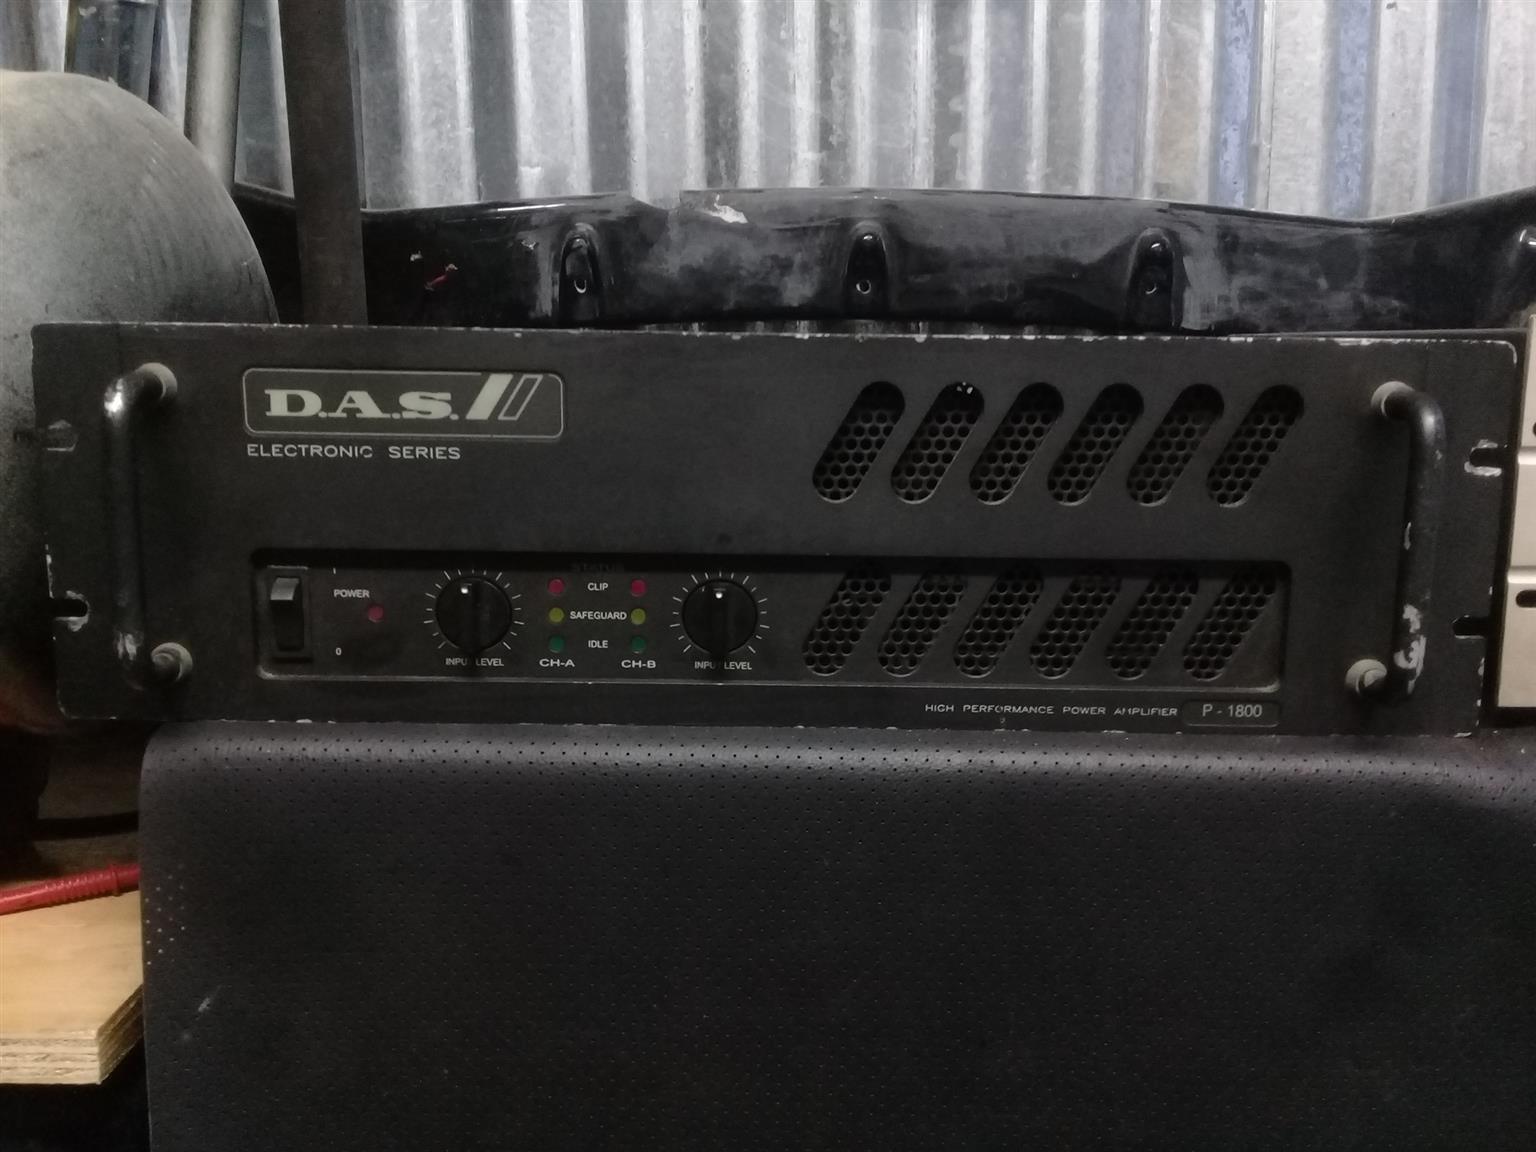 Jb systems Ctwo 800 & Das P1800